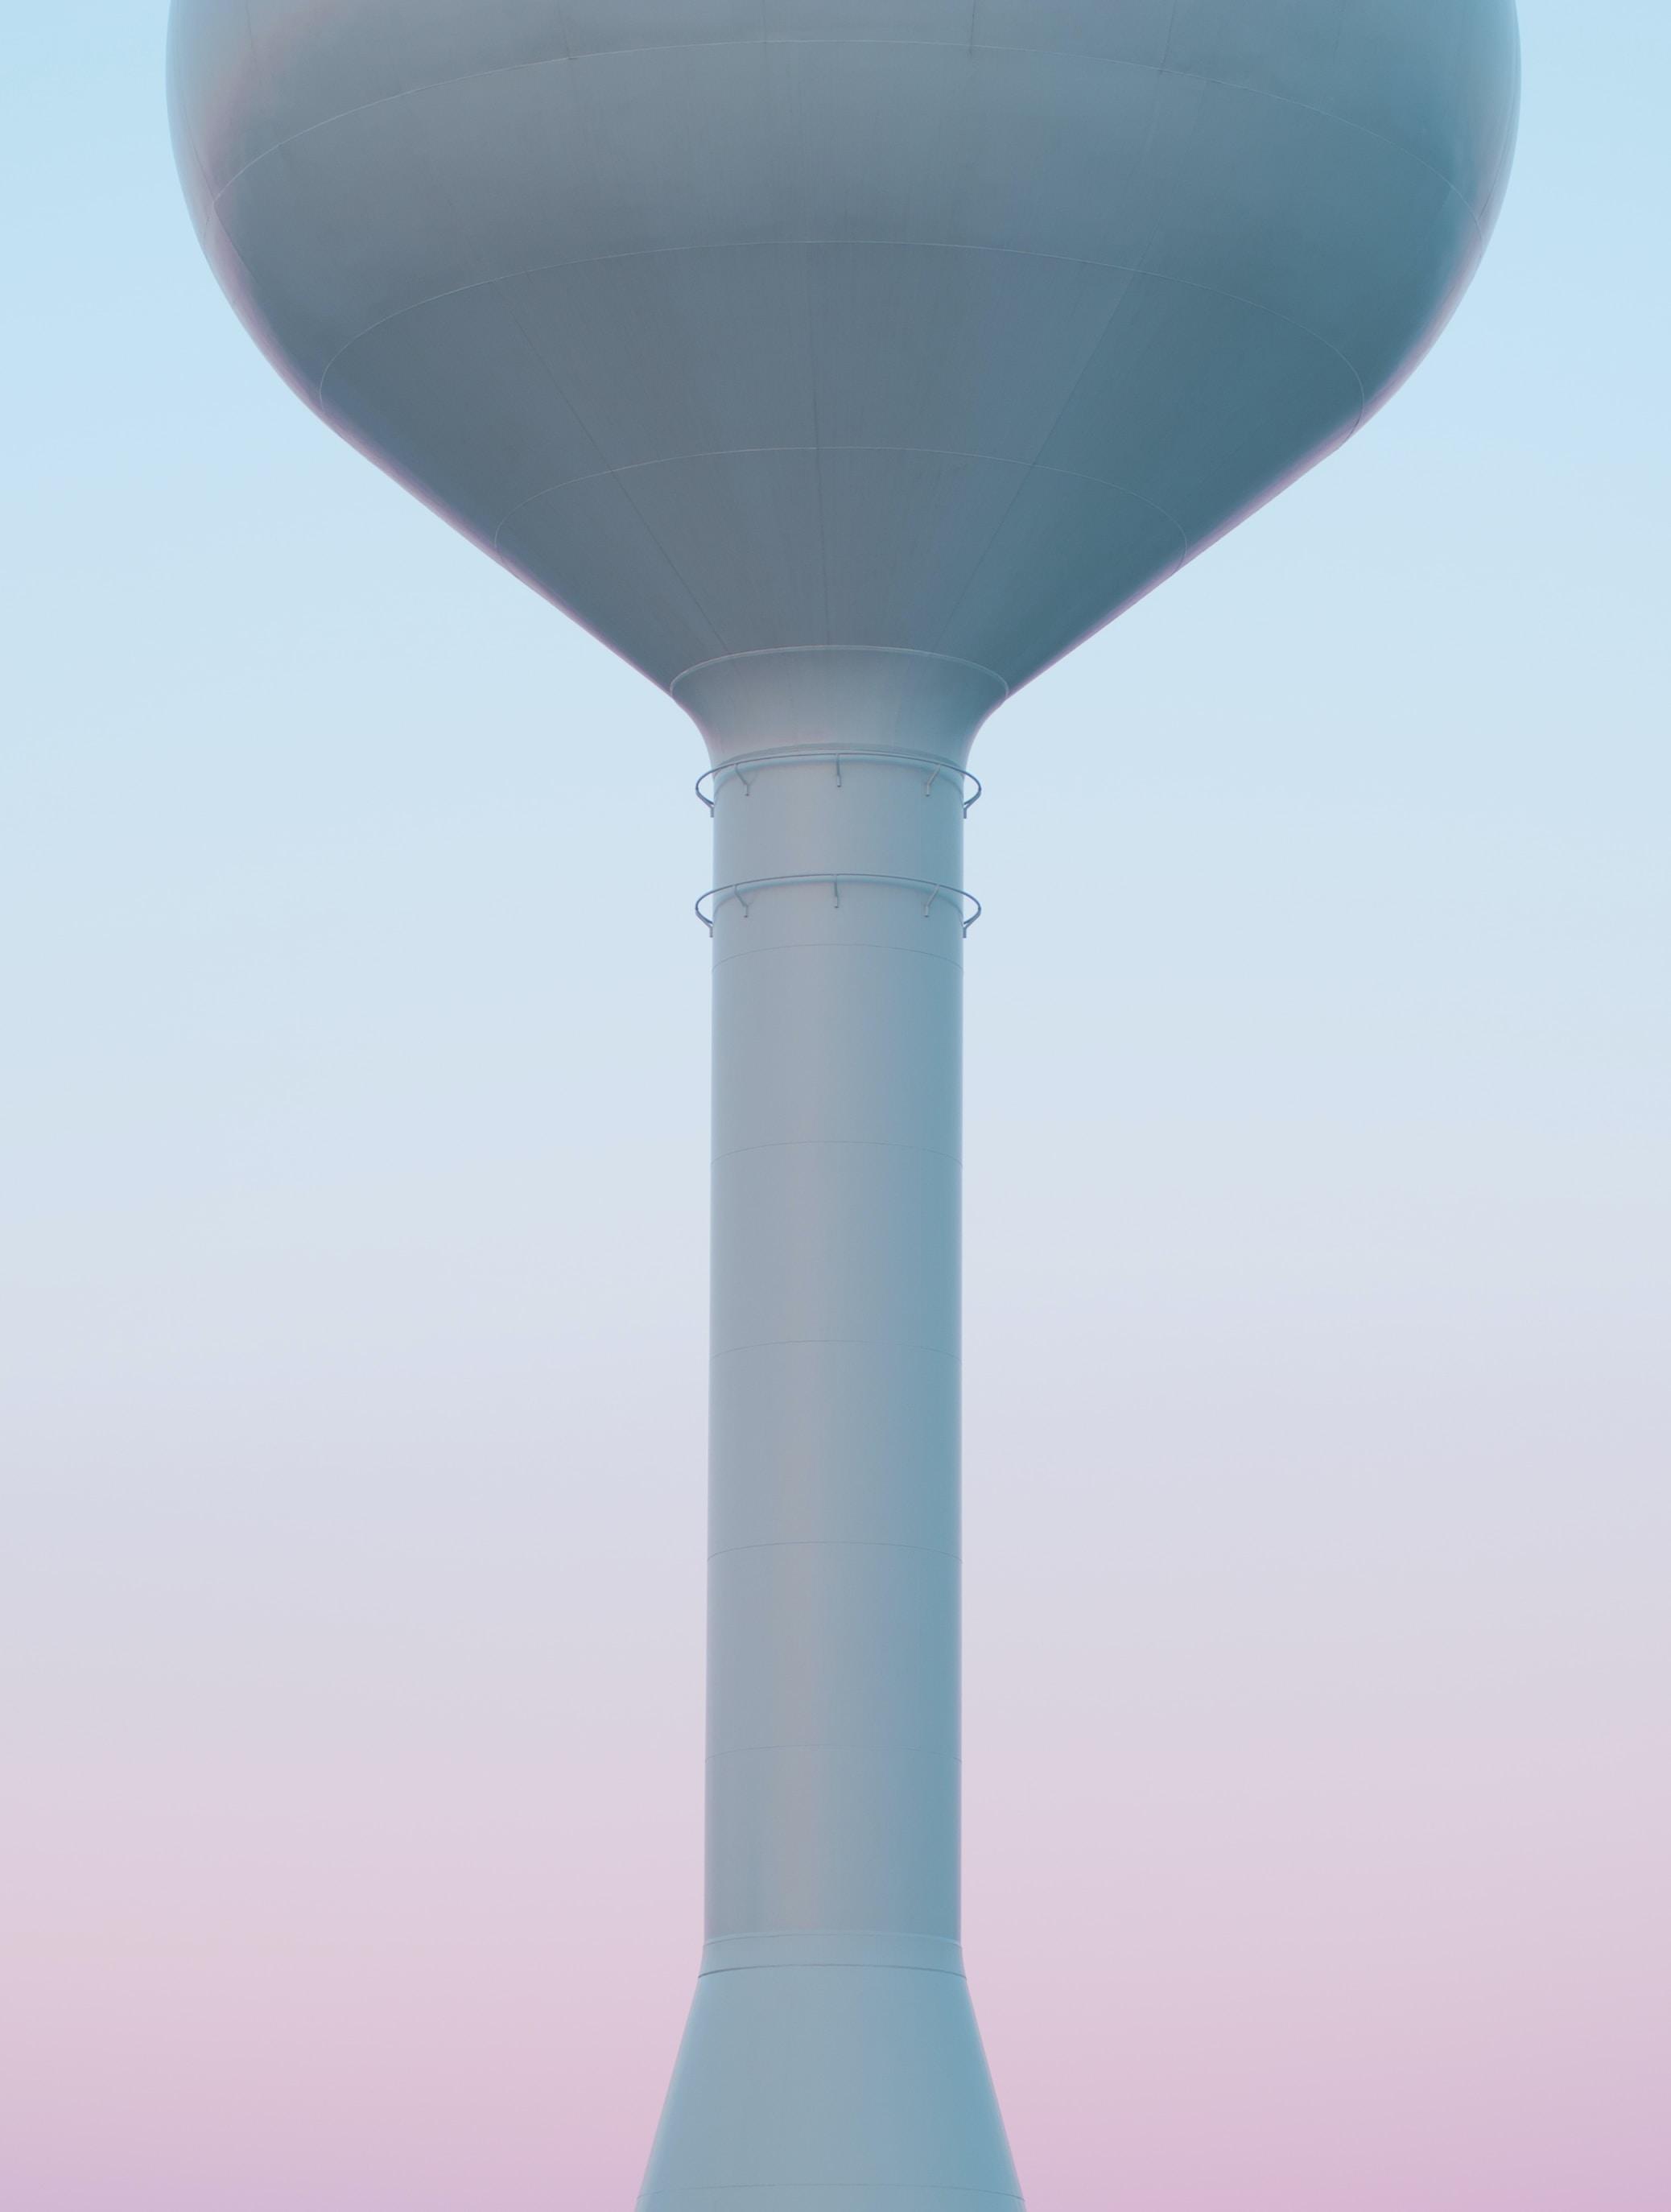 gray concrete silo under cloudy sky